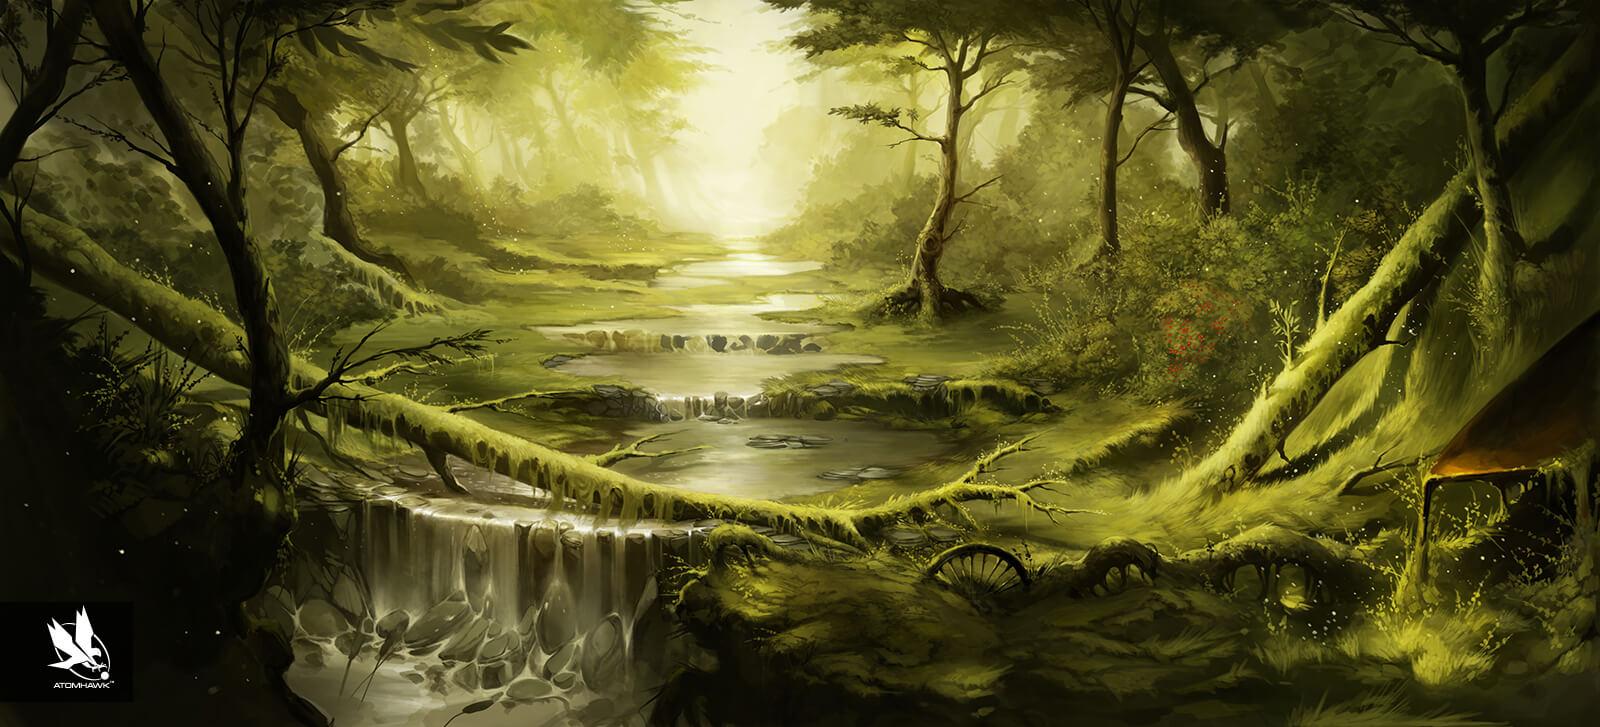 Atomhawk_The-Realm_Concept-Art_Environment-Design_Forest-Brook.jpg